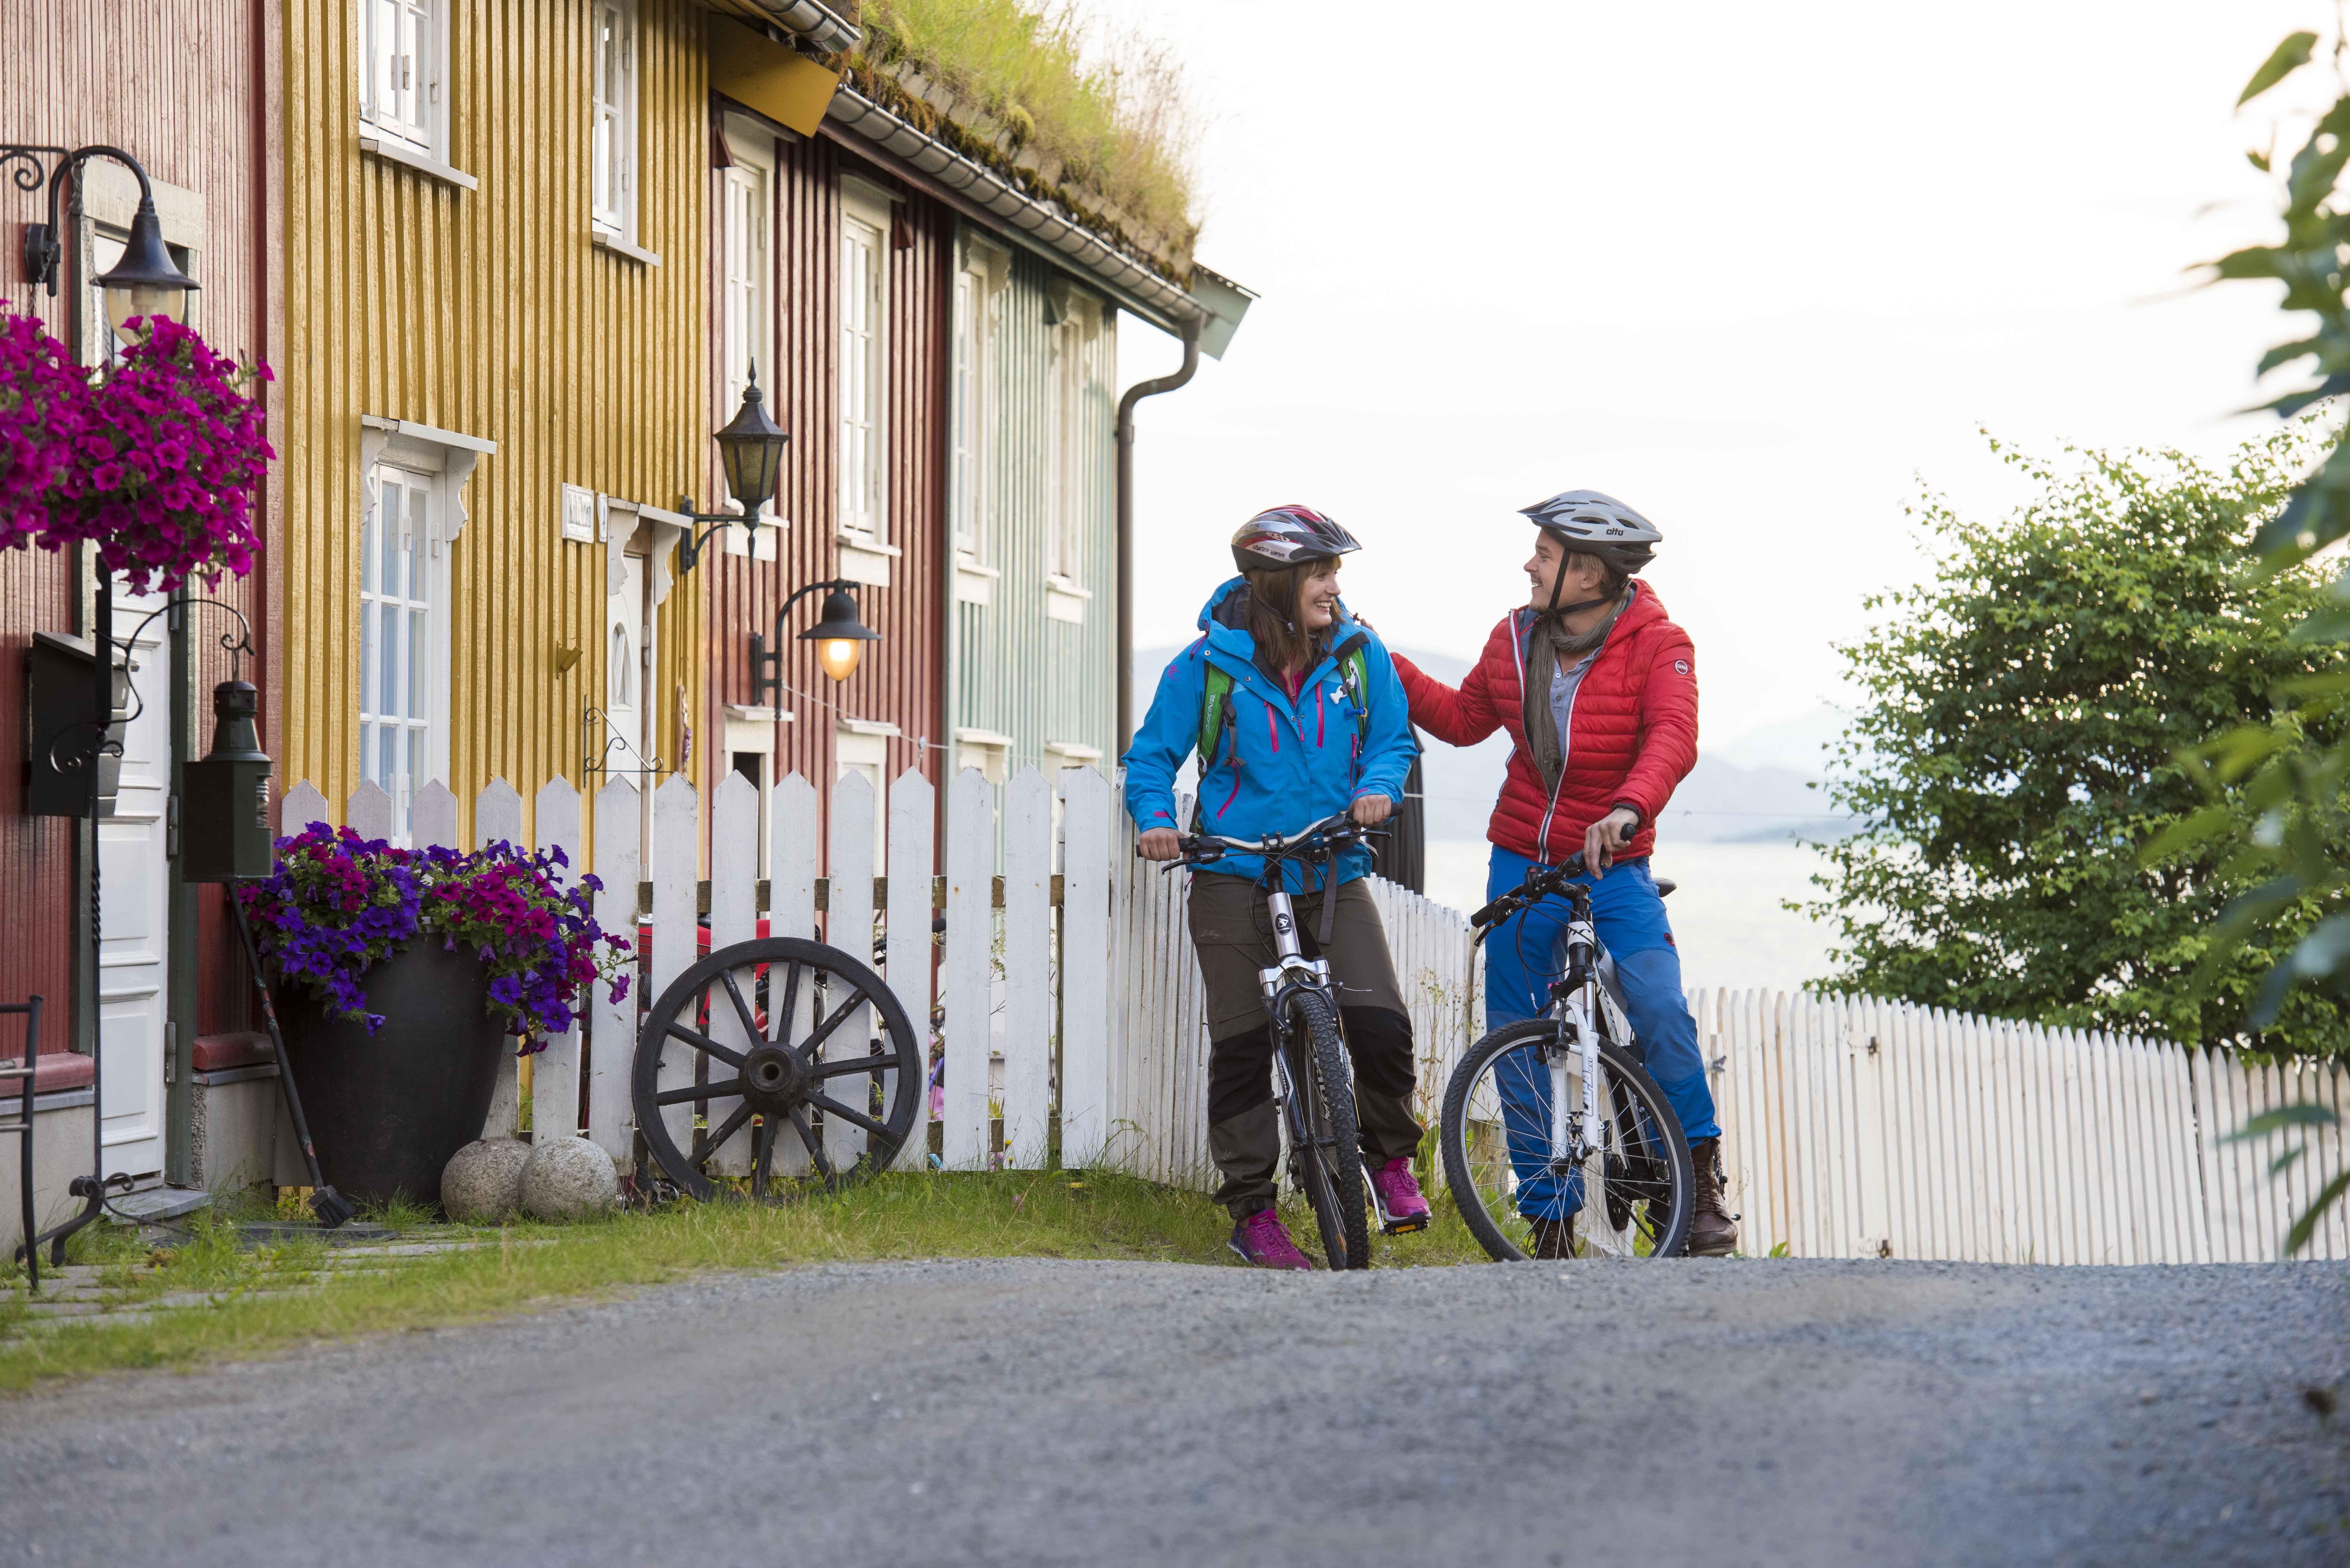 Historisk Guiding i Sjøgata